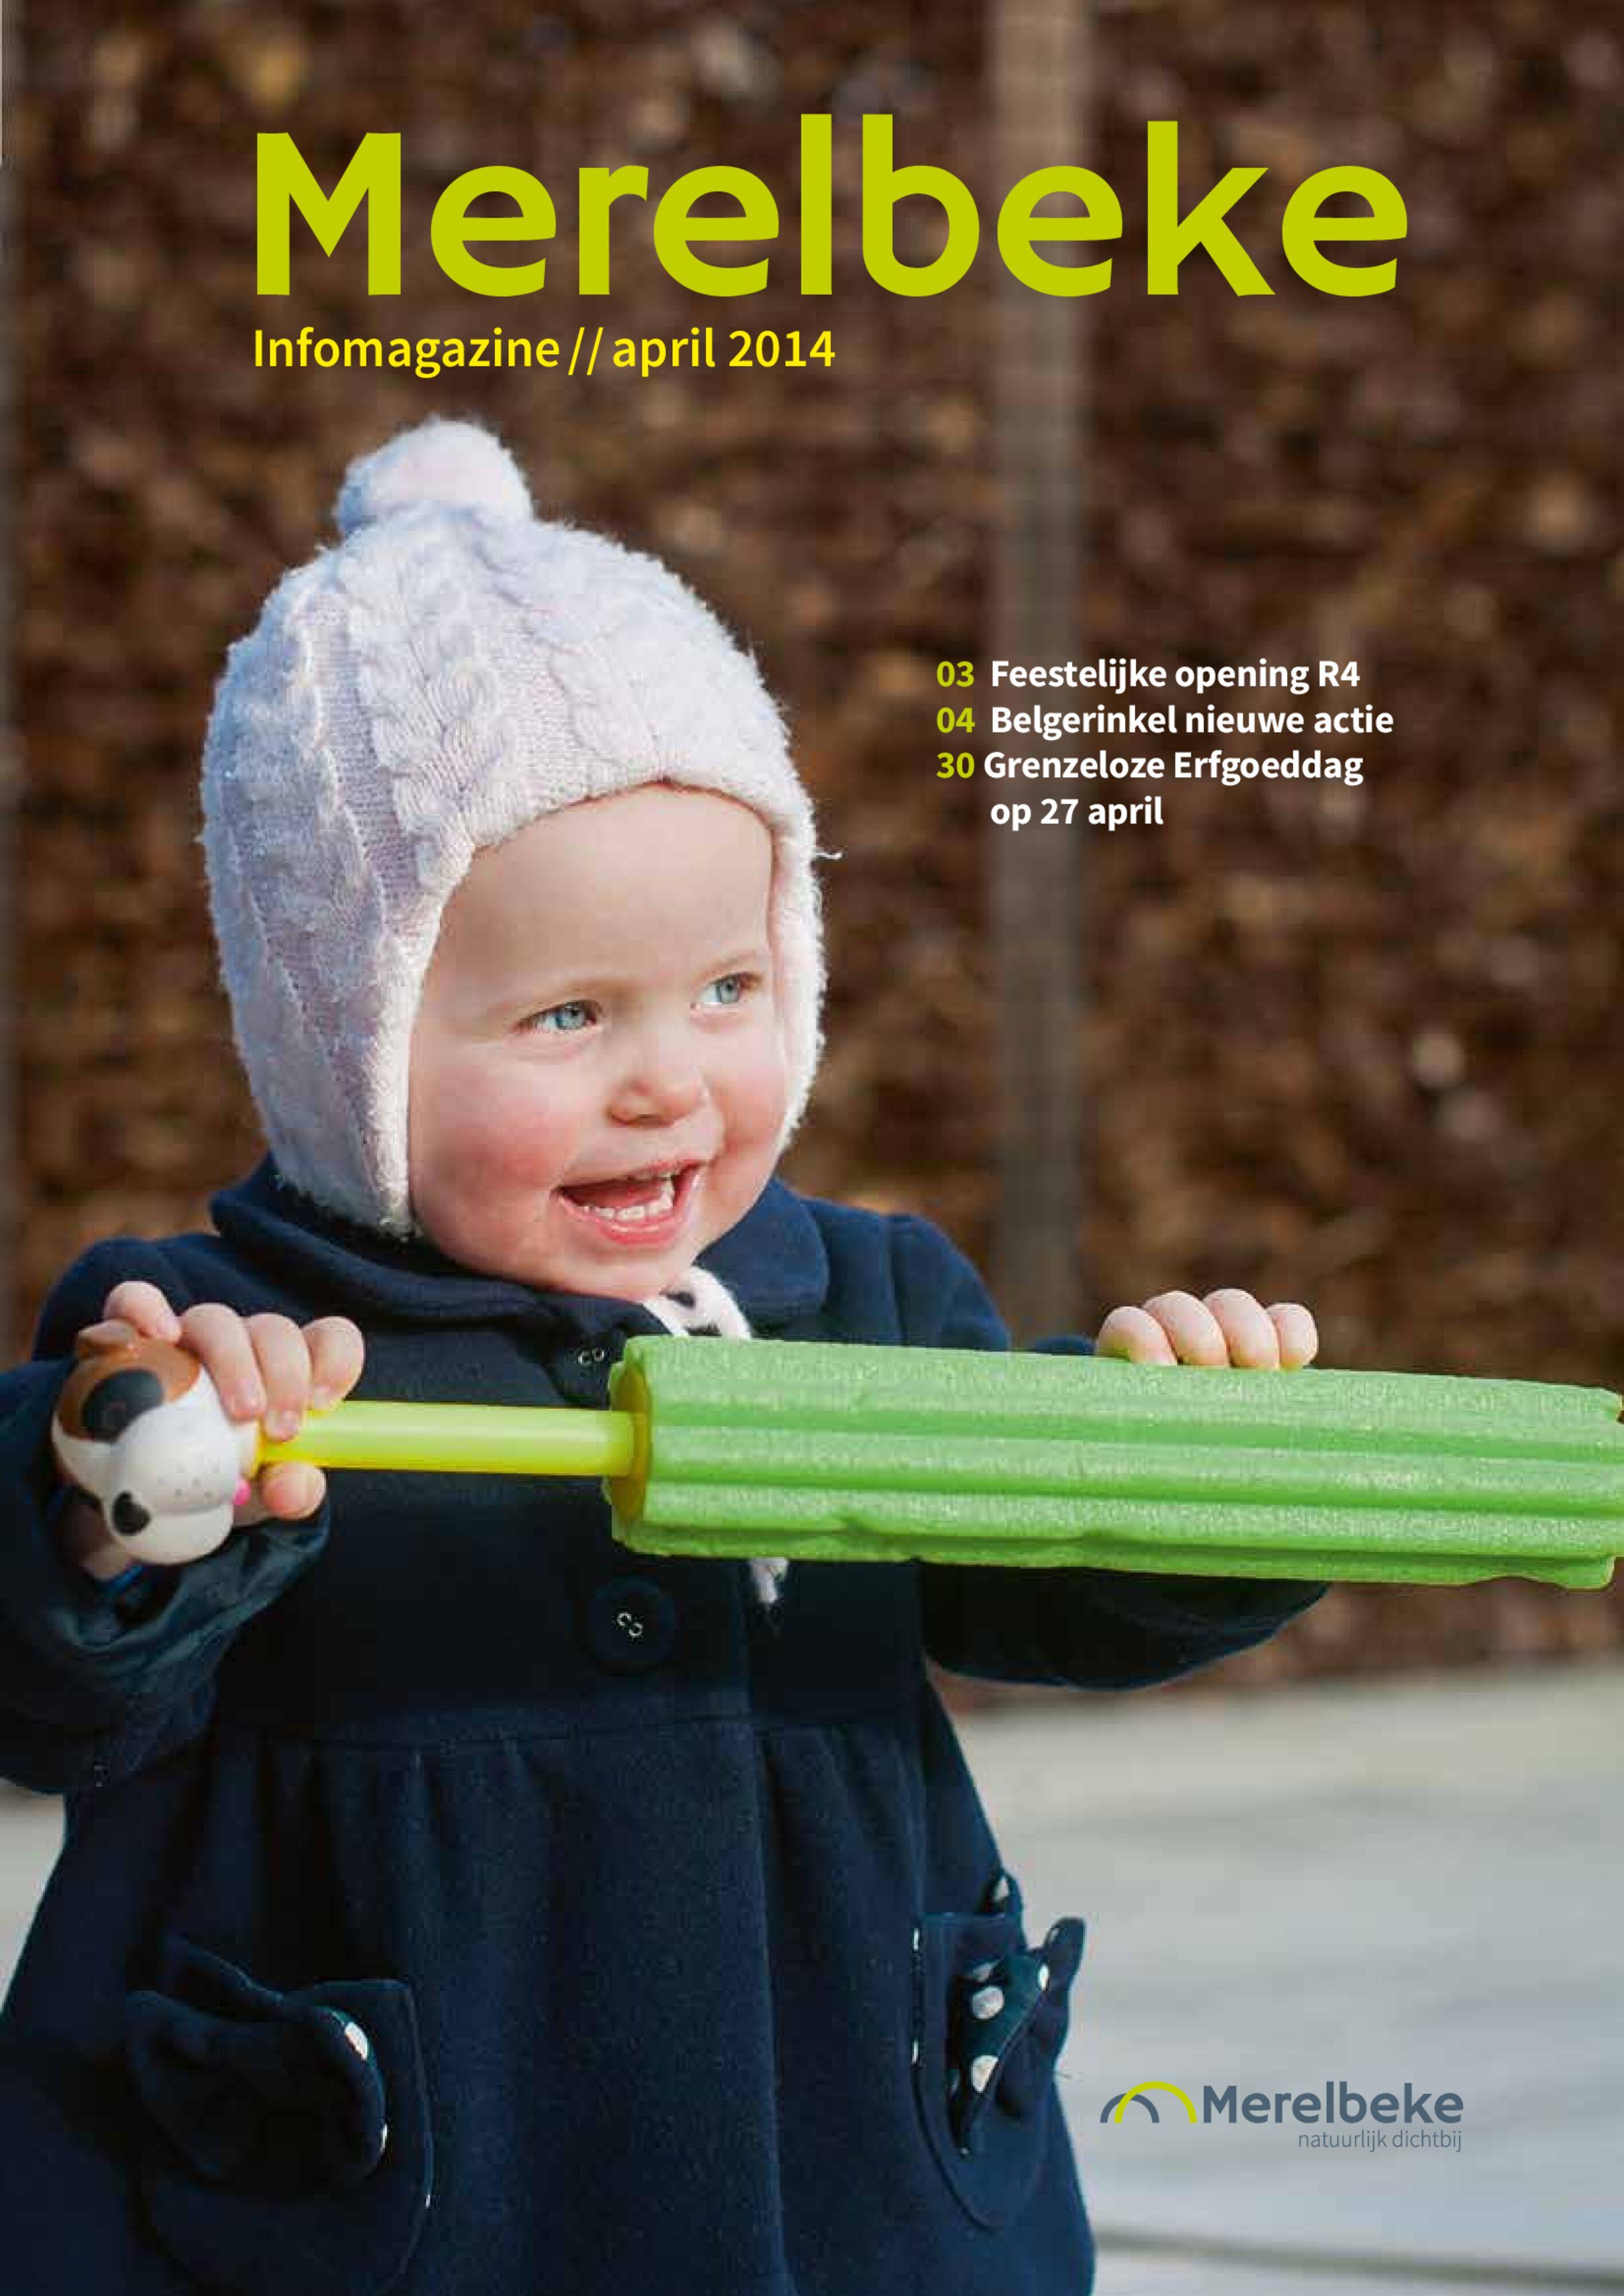 Infomagazine april 2014